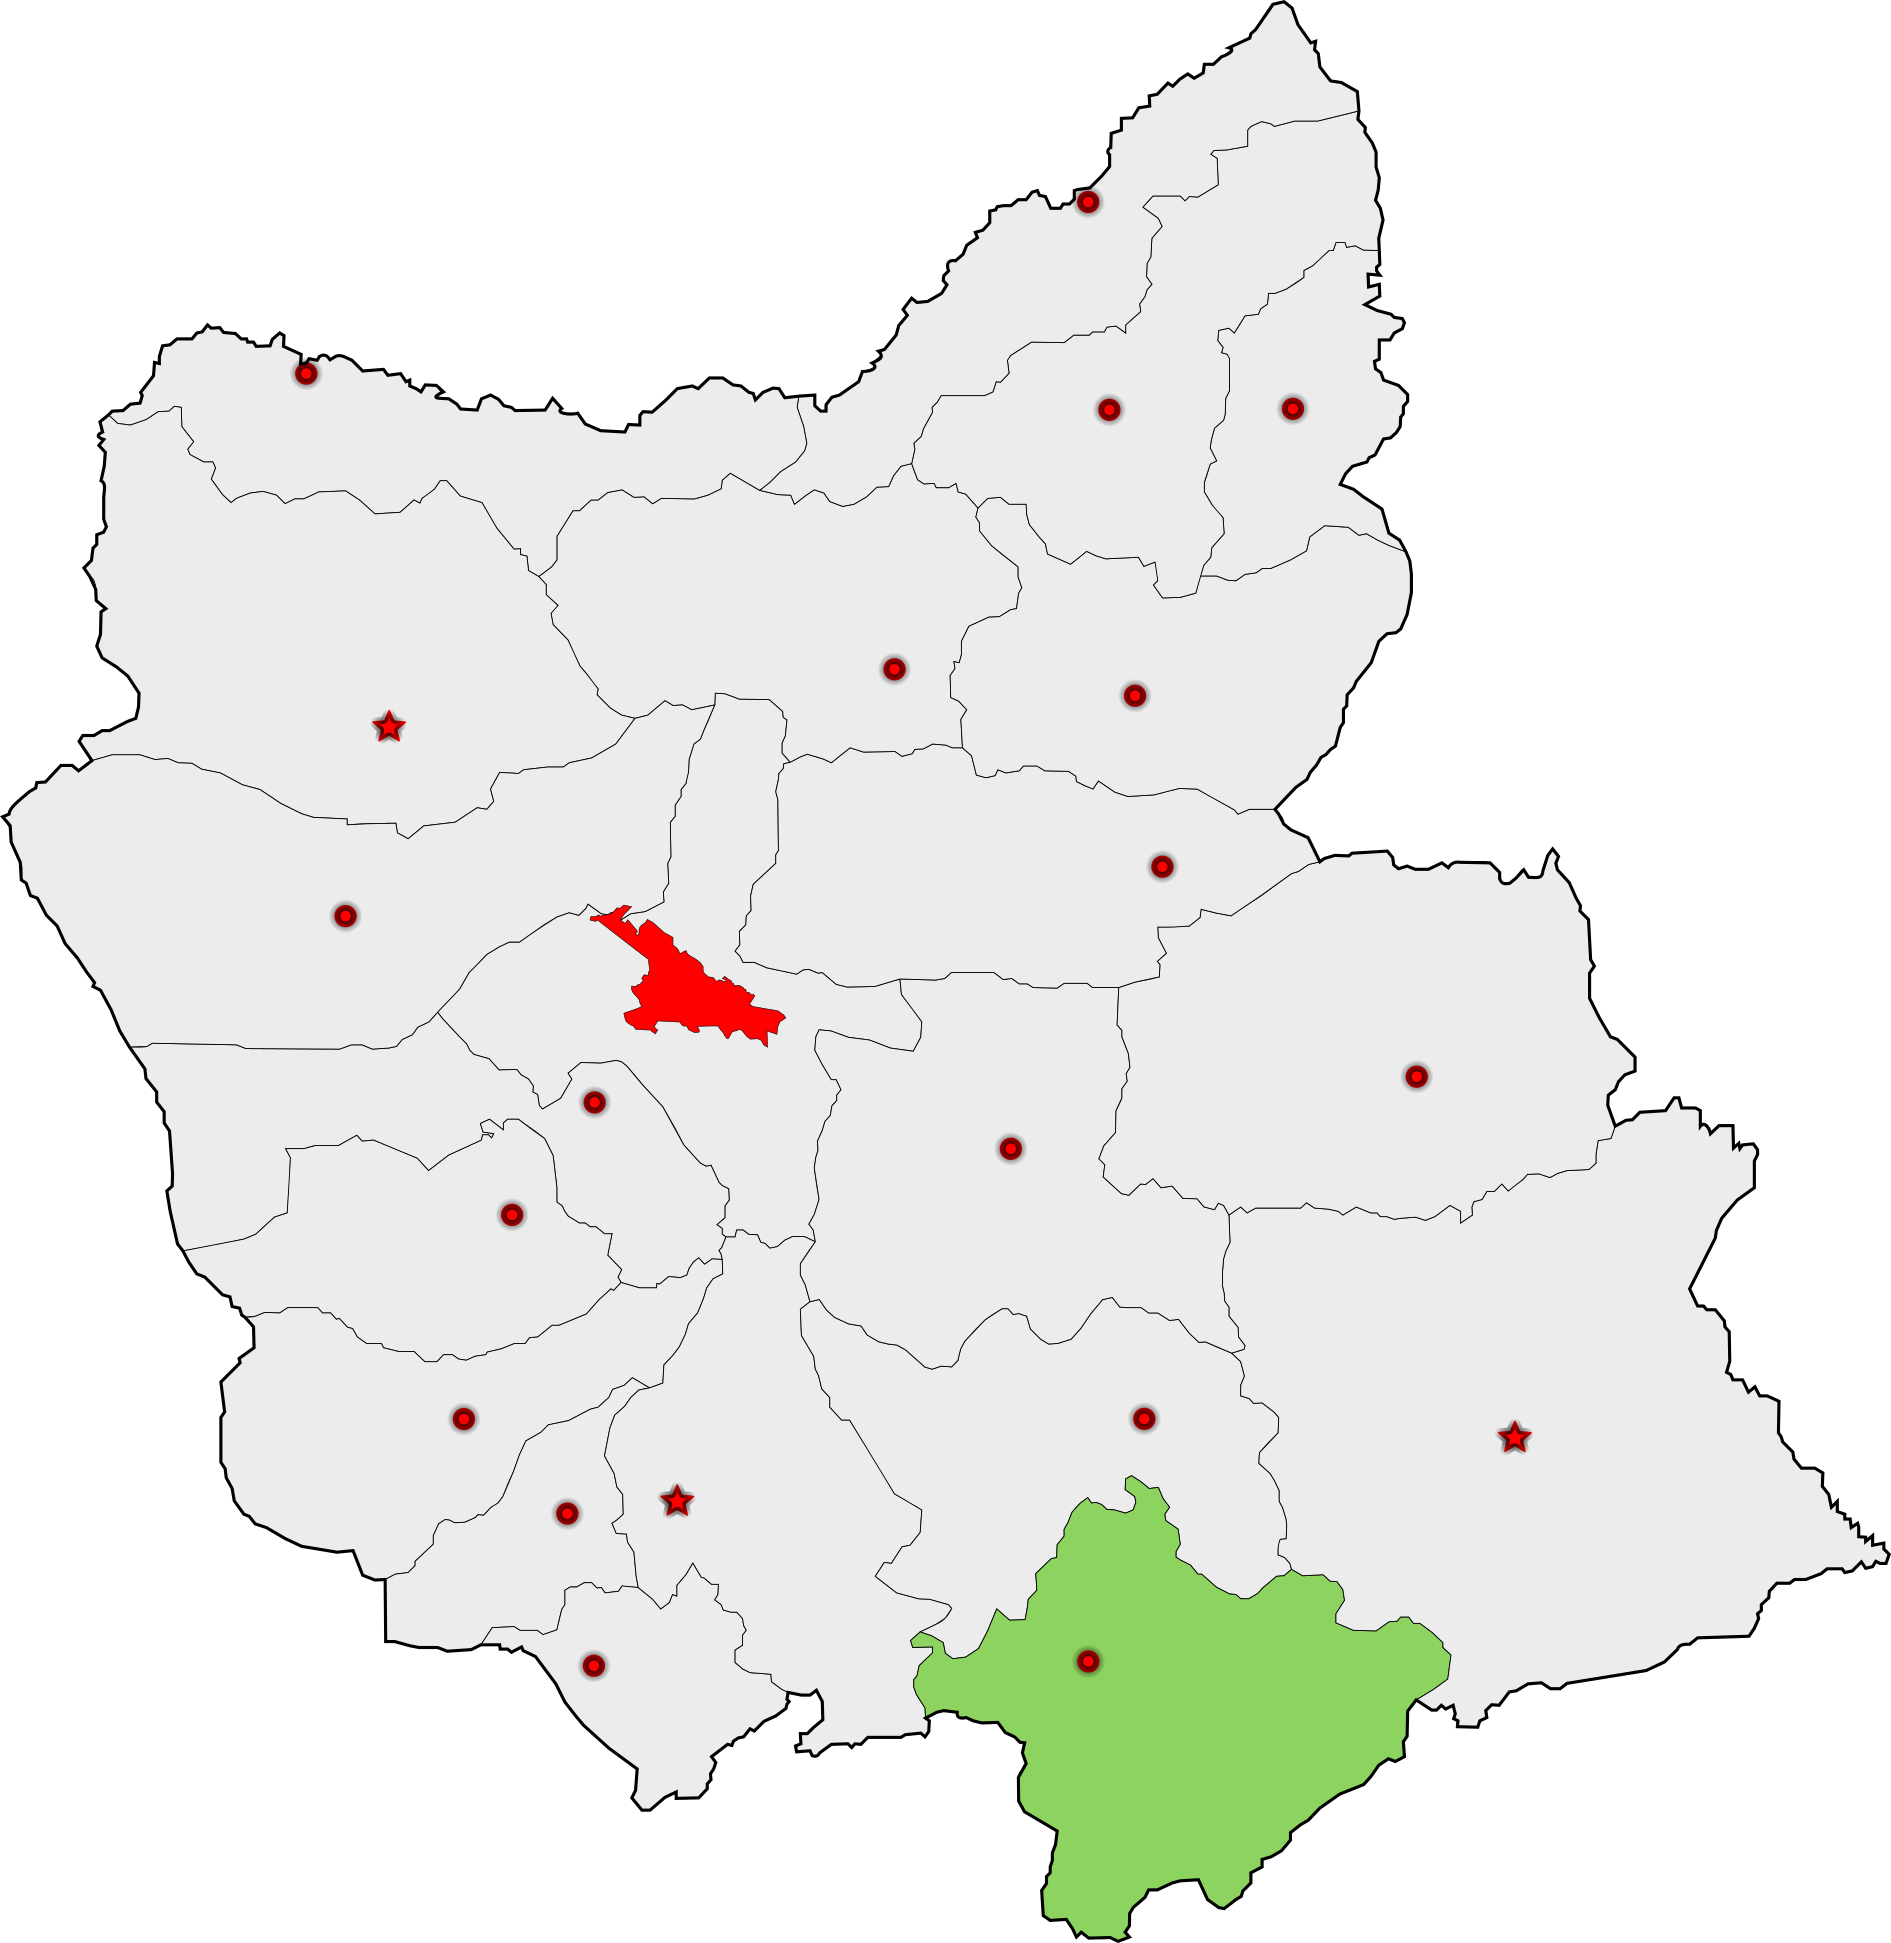 شهرستان چاراویماق